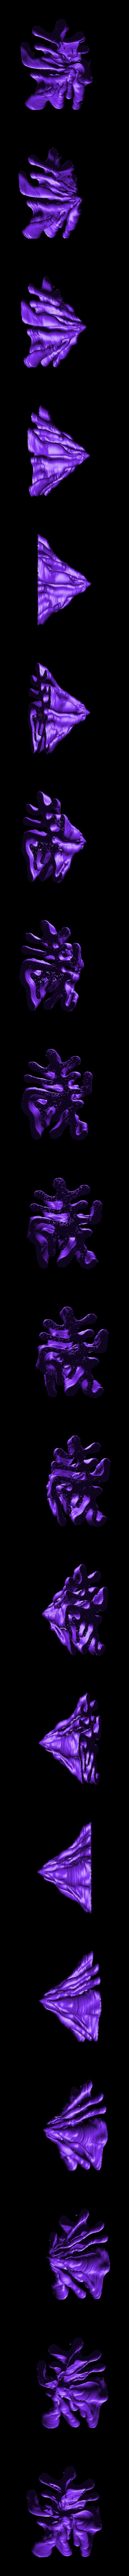 dragonmountain1.stl Download free STL file Weird terrain collection • 3D printer object, ferjerez3d